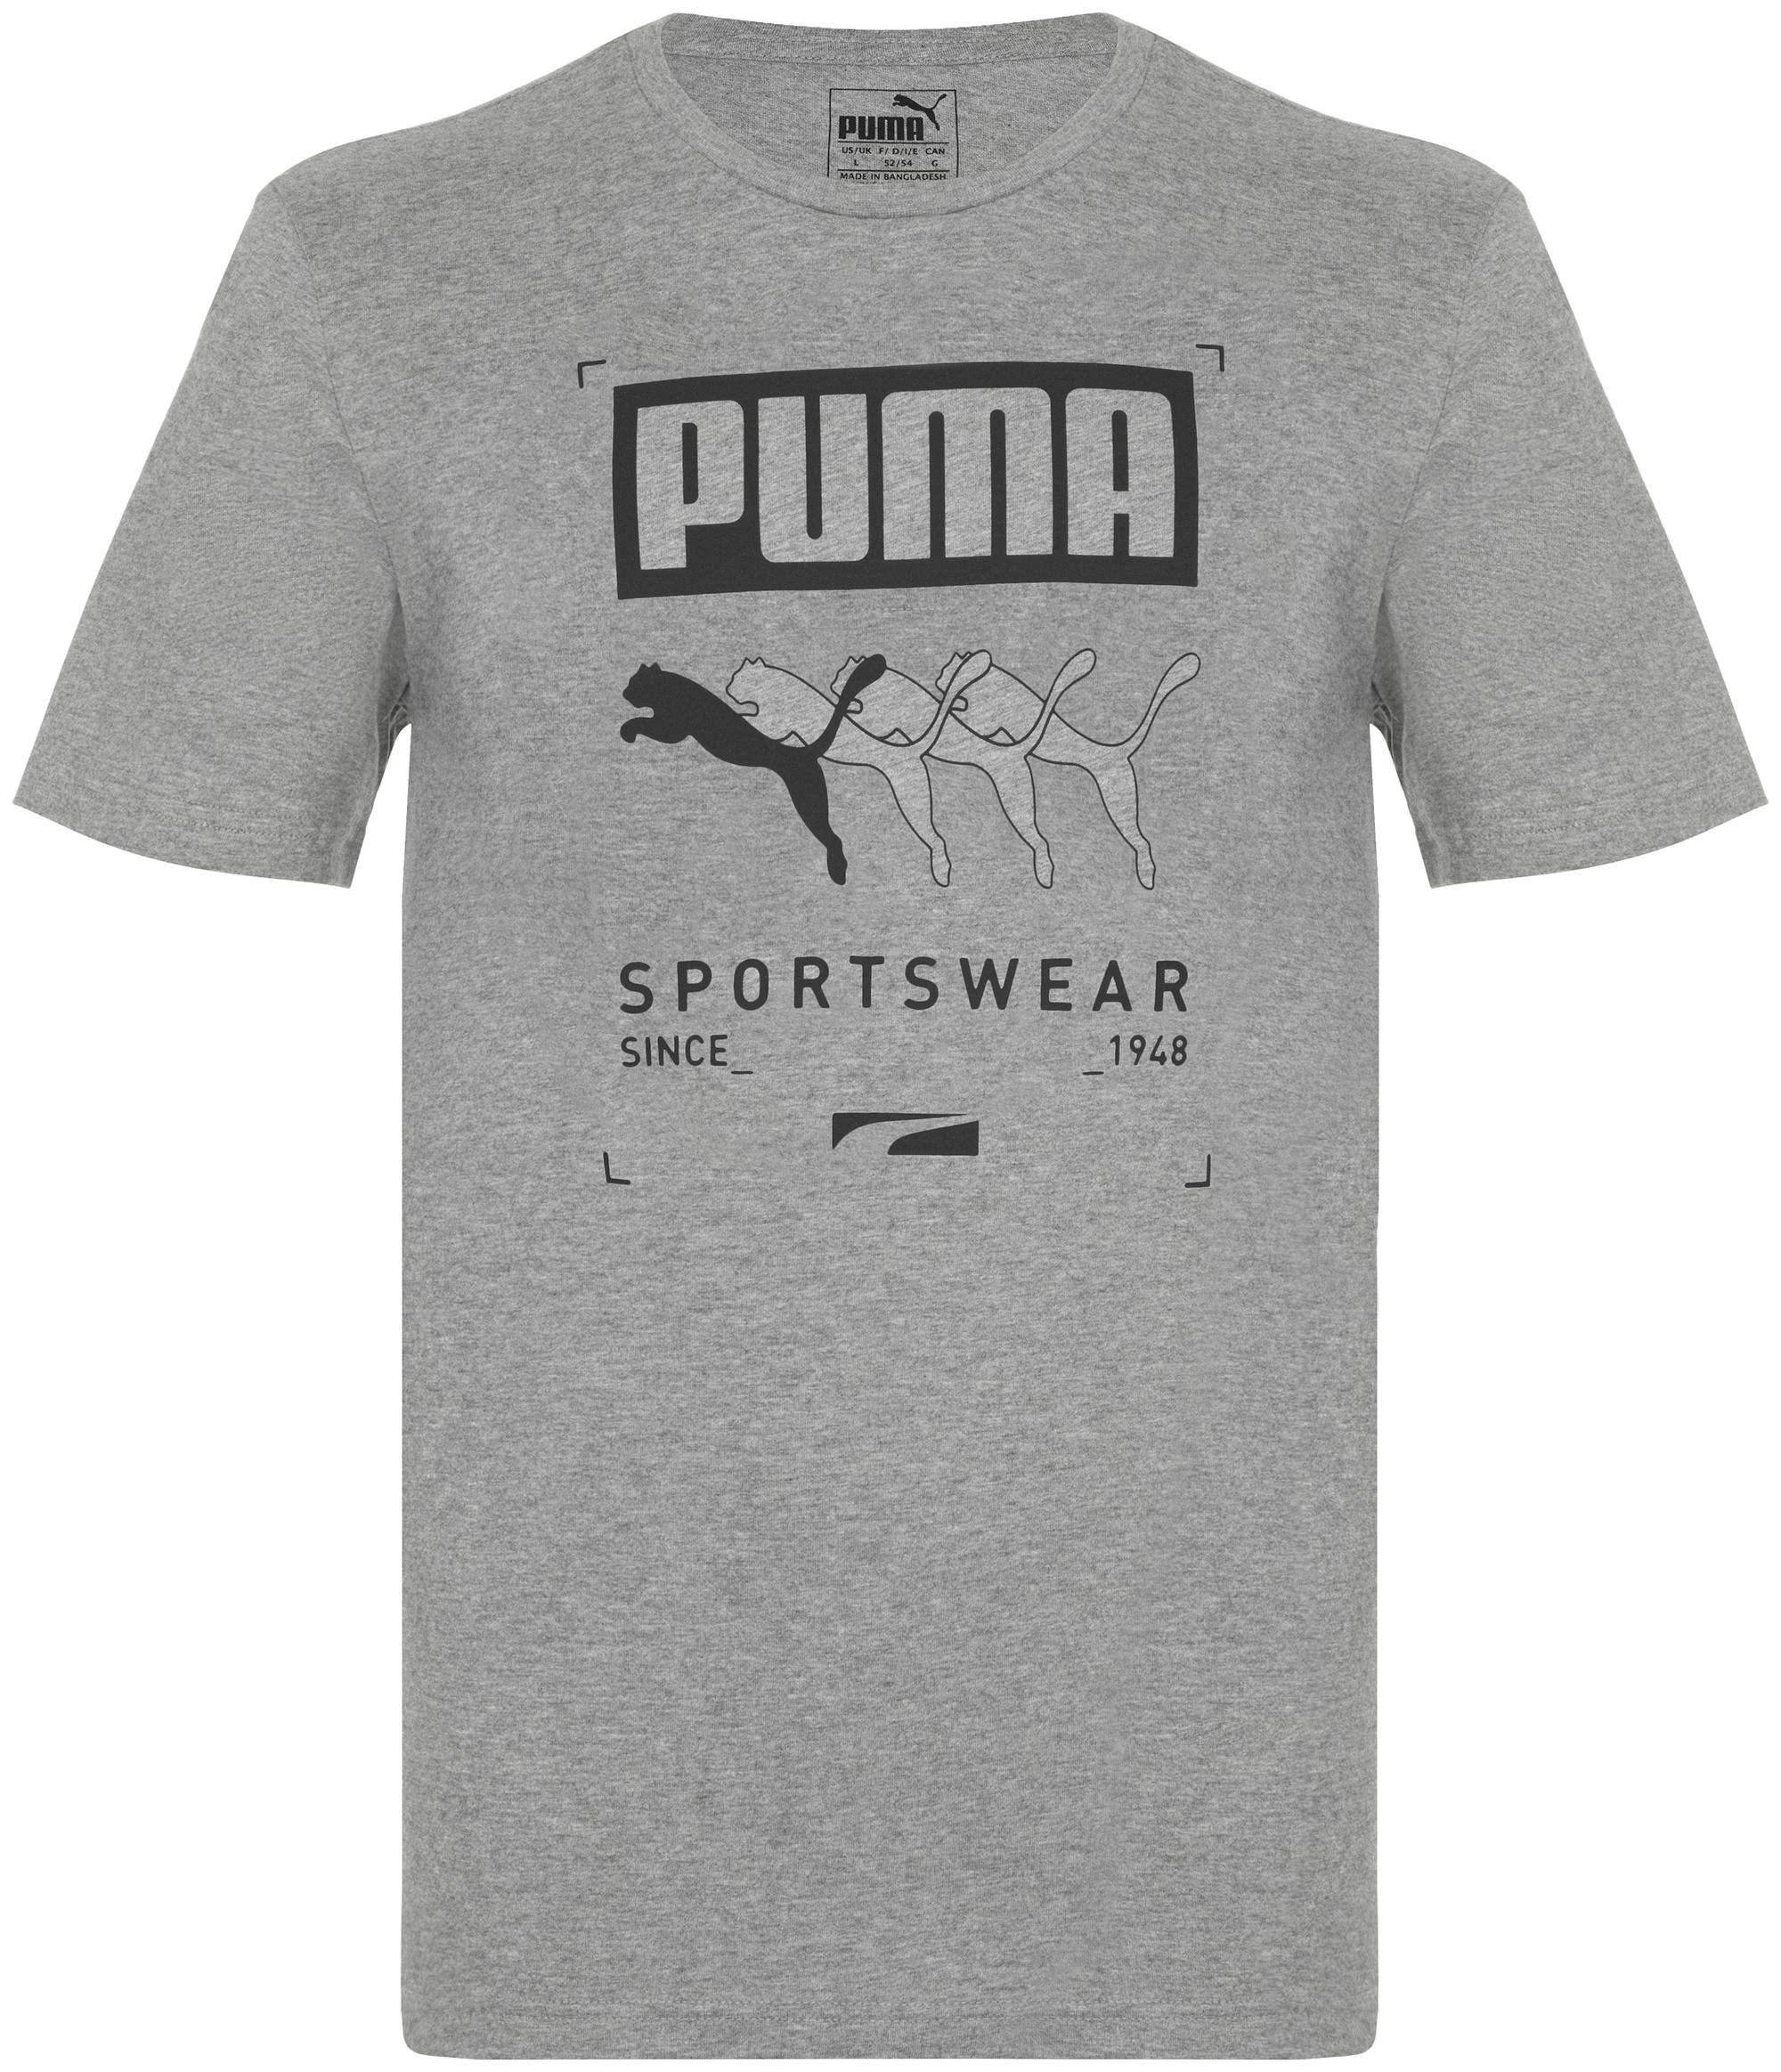 PUMA Футболка мужская Puma Box Tee, размер 50-52